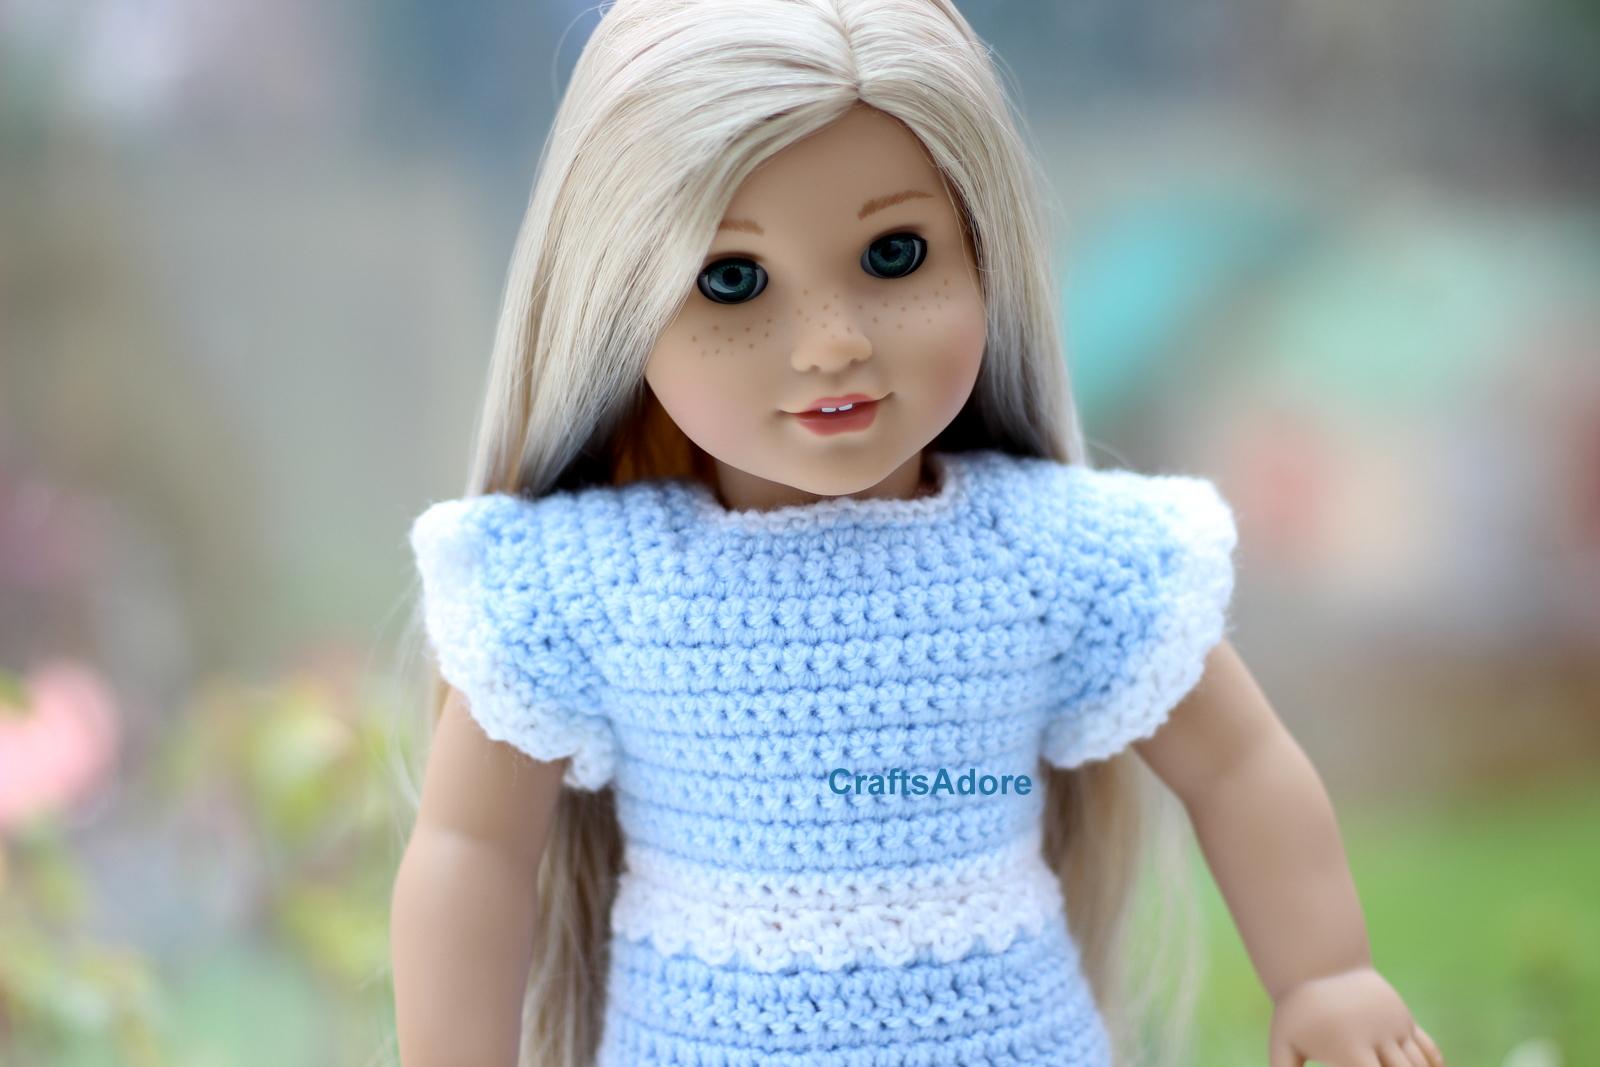 Crochet Patterns American Girl Doll : ... for American Girl Doll or other 18 inch dolls Free Crochet Pattern